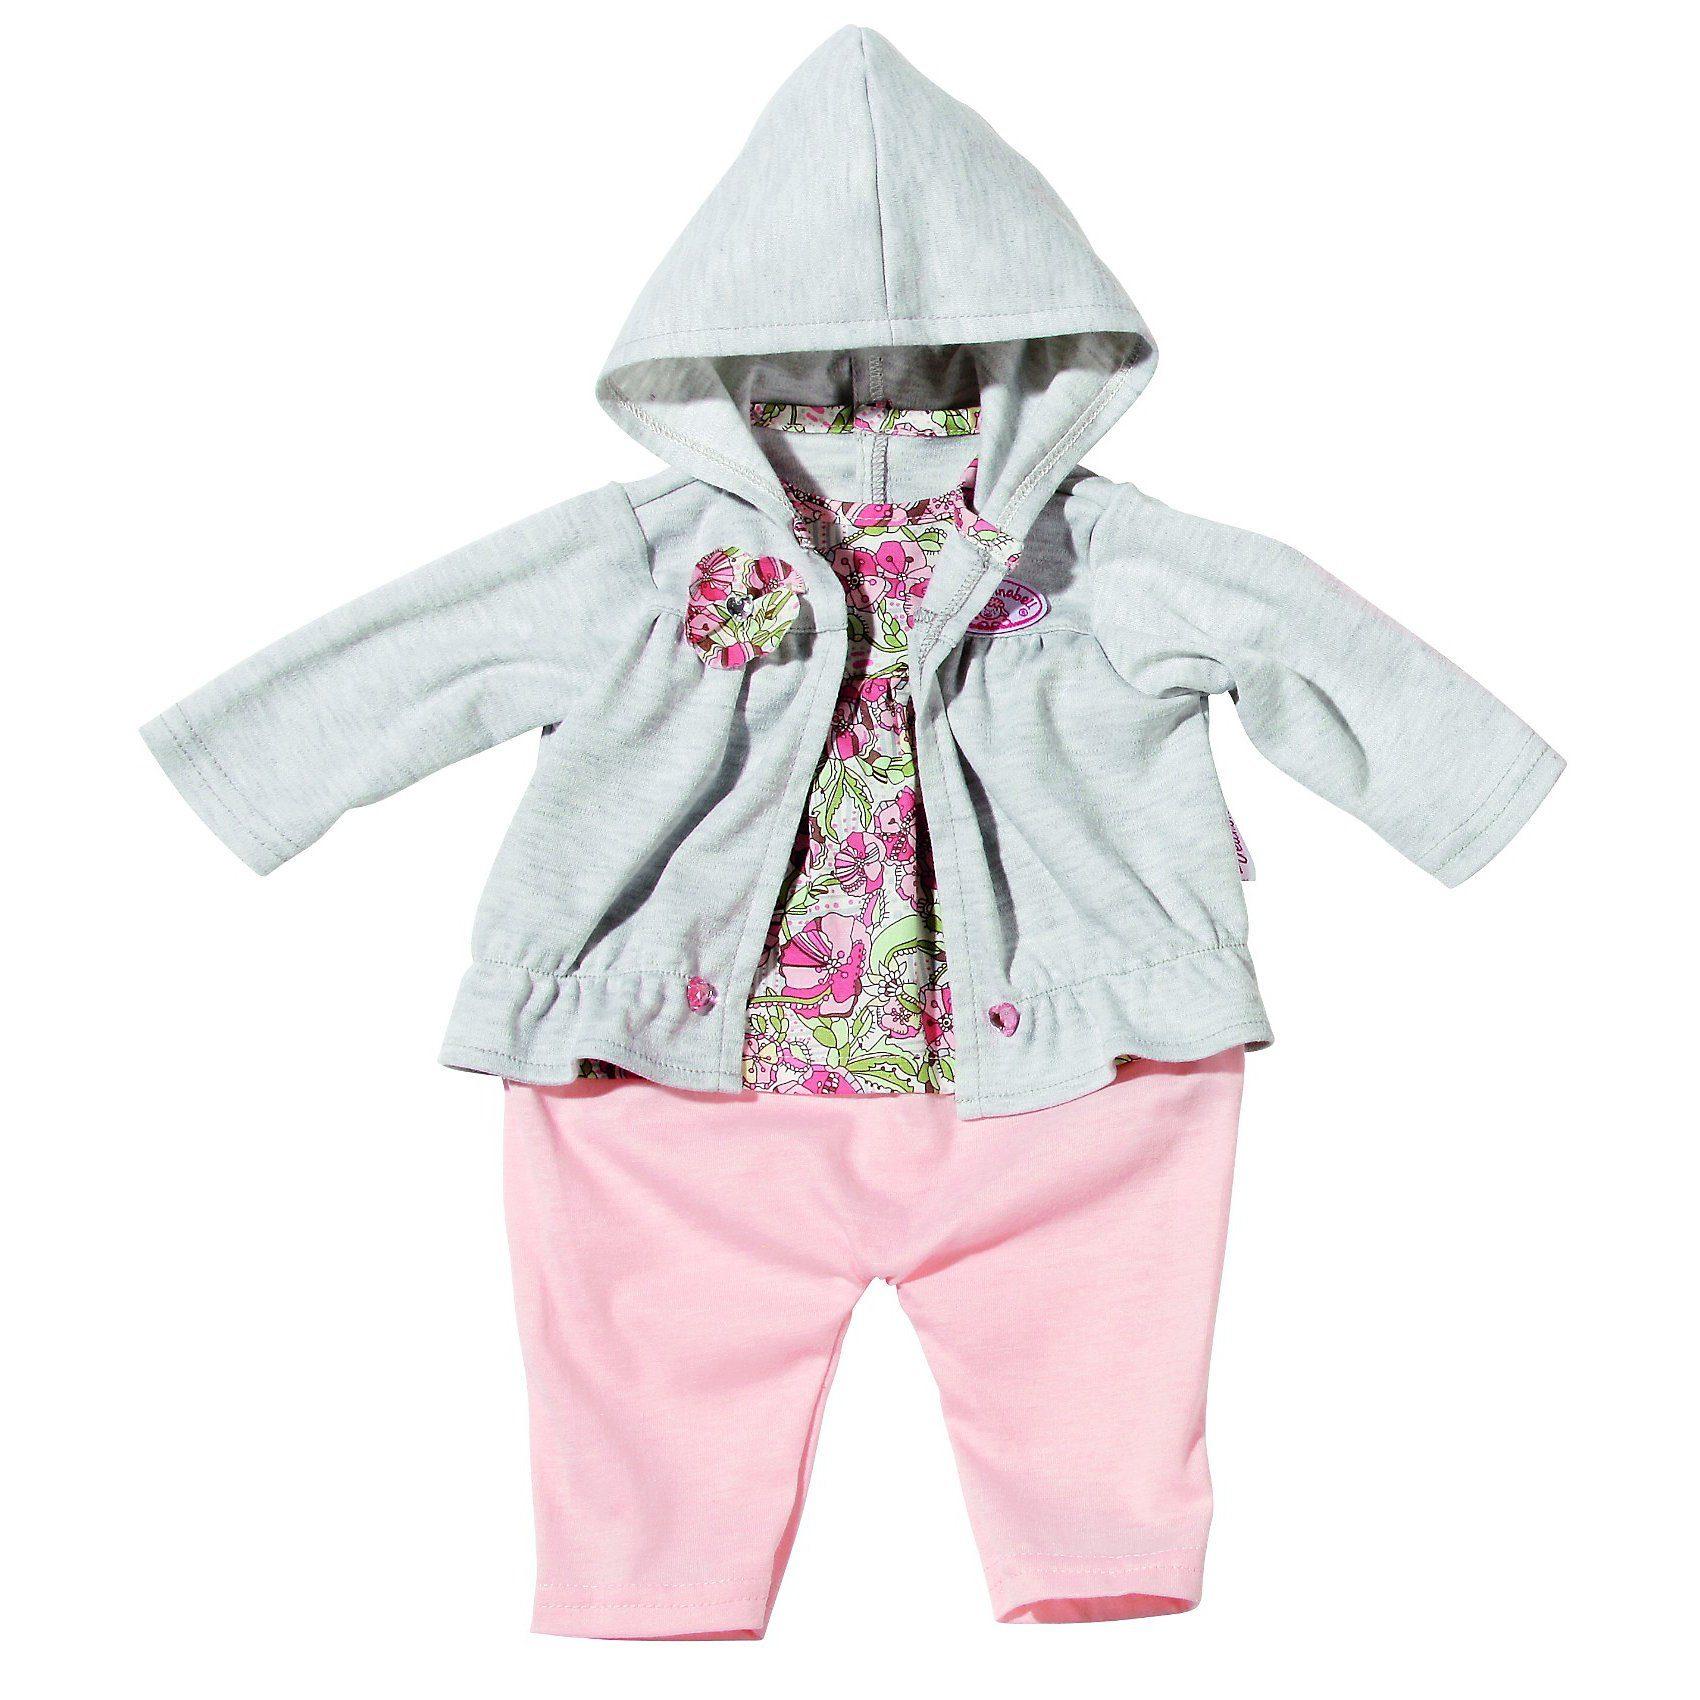 Zapf Creation Baby Annabell® Kleidung, 46 cm